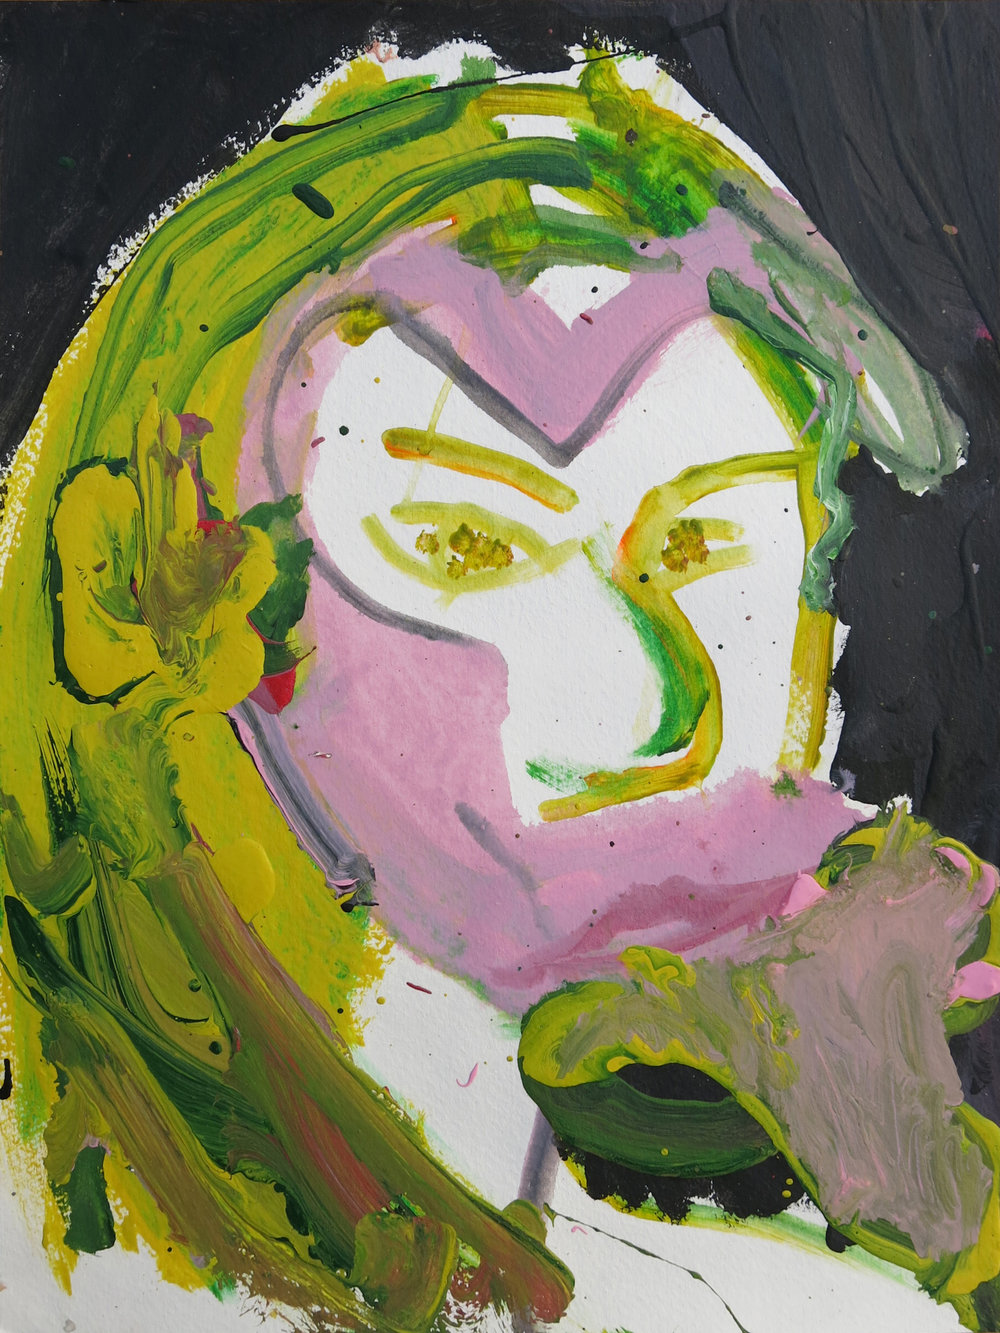 Barbra Streisand Portrait #61